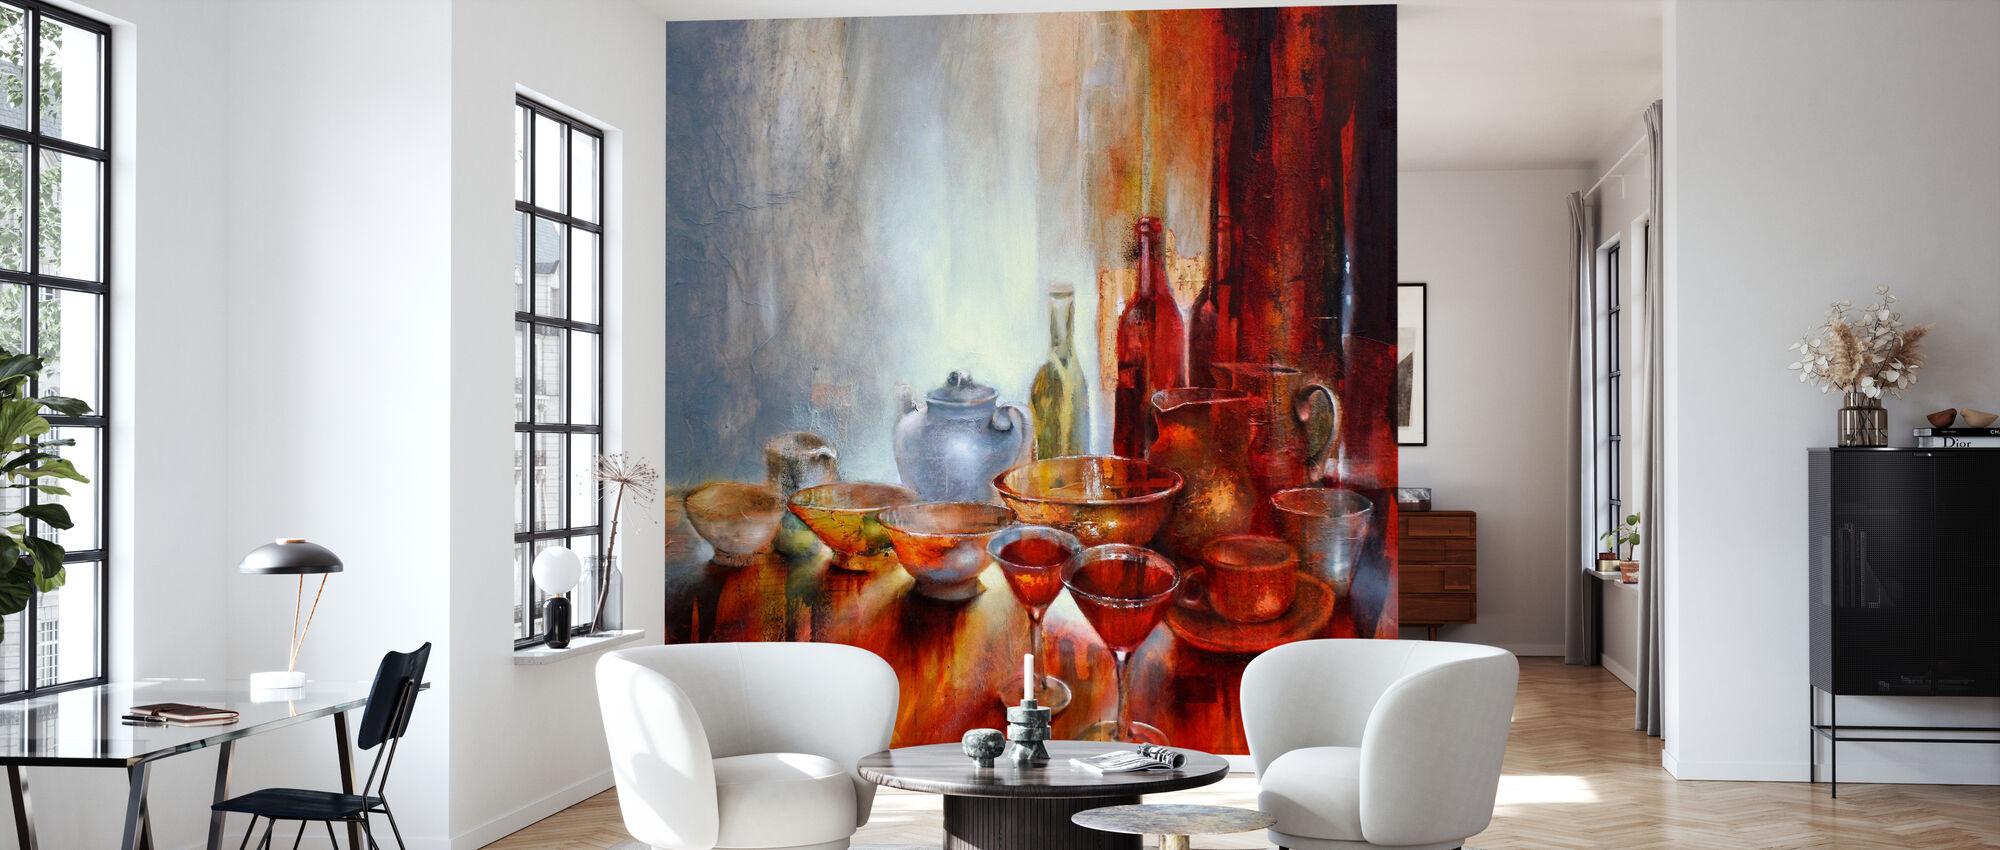 Still Life with Gray Teapot - Wallpaper - Living Room